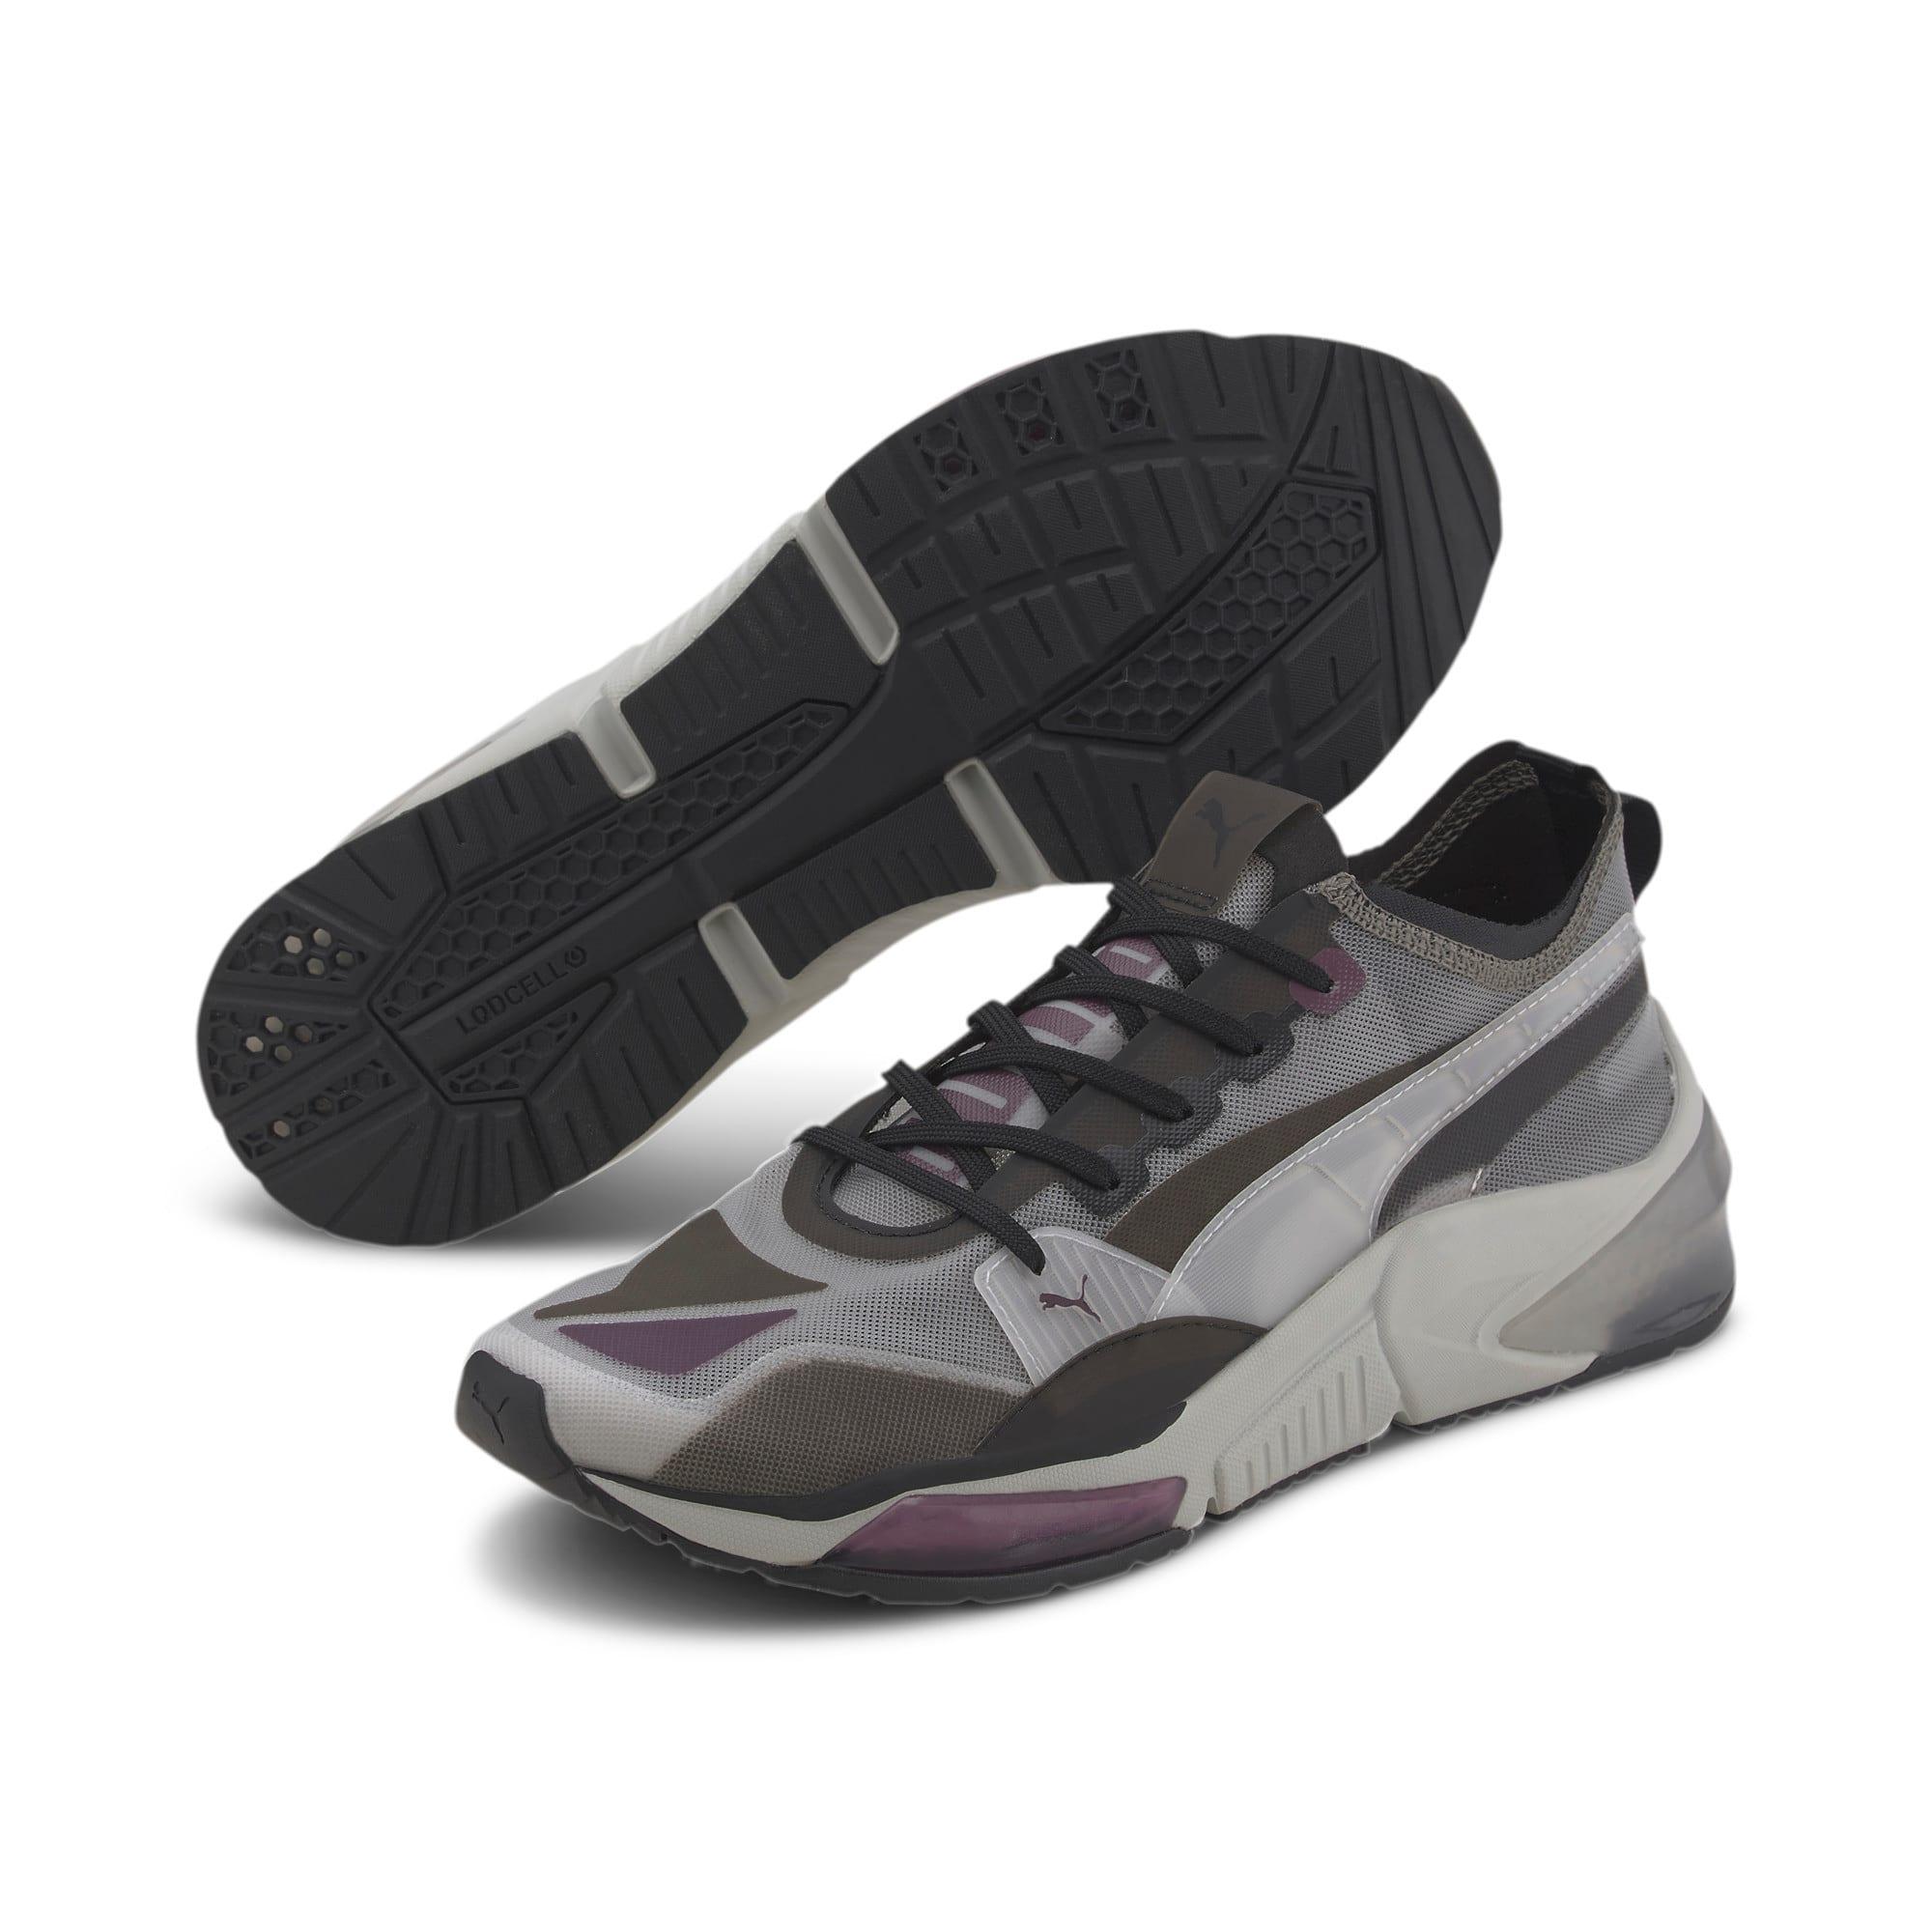 Thumbnail 2 of LQDCELL Optic Sheer Men's Training Shoes, Gray Violet-Puma Black, medium